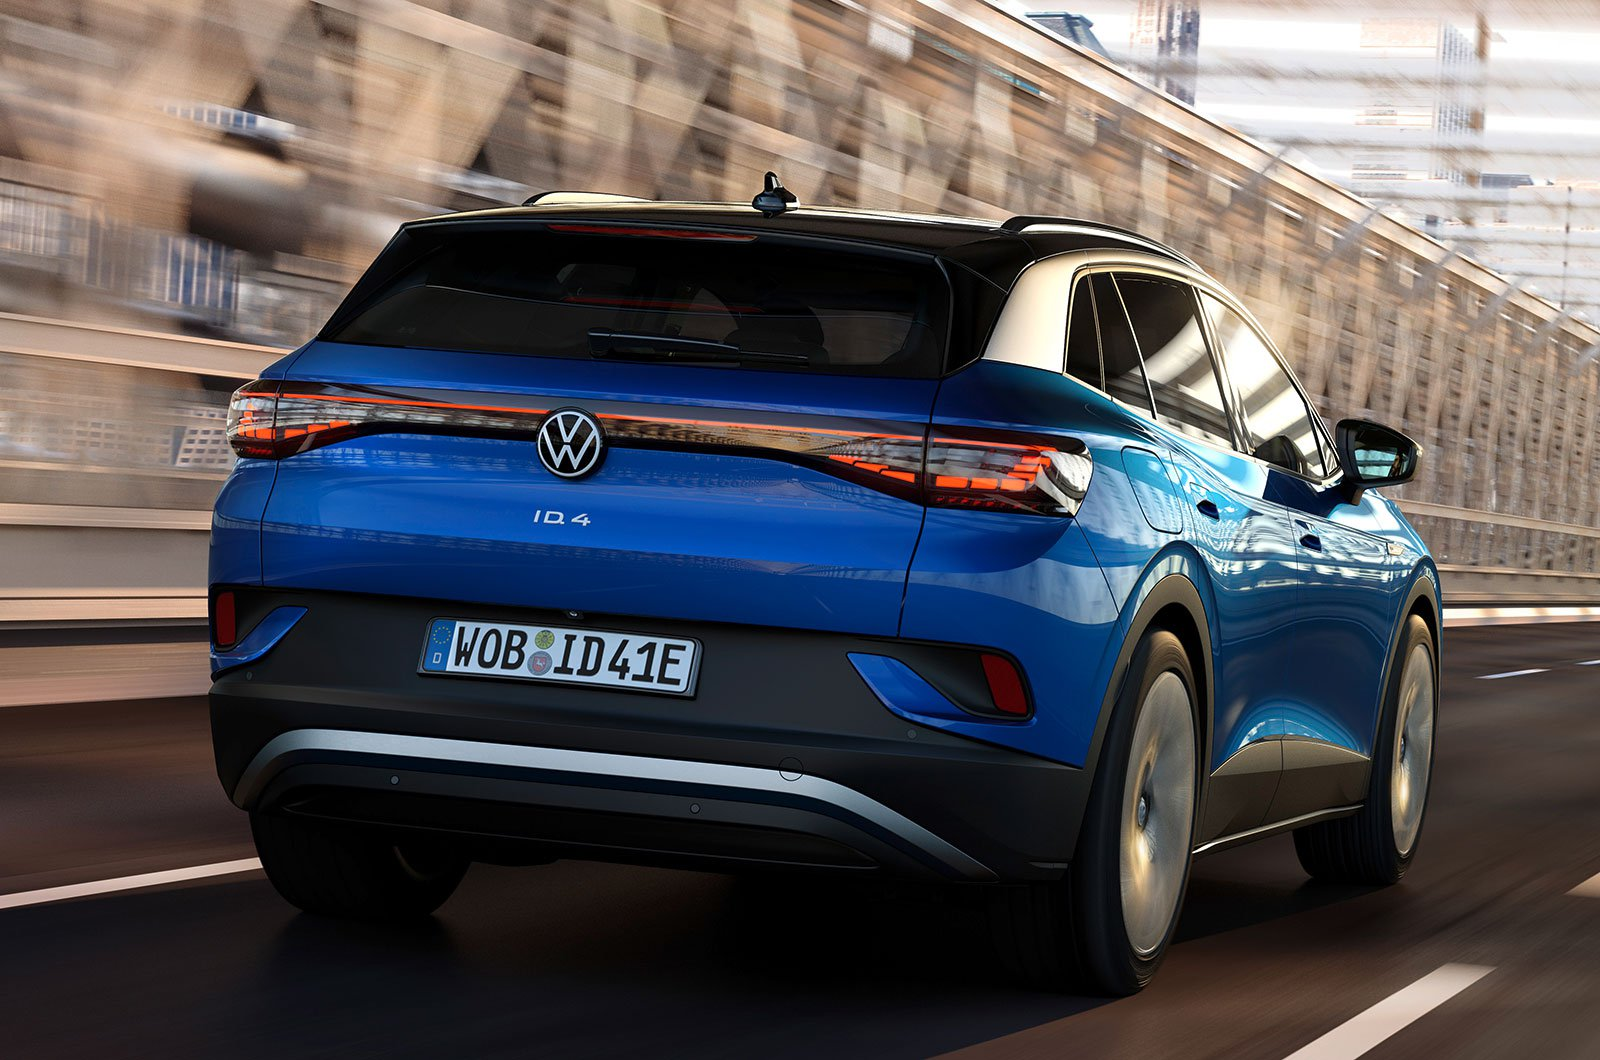 2021 Volkswagen ID.4 rear